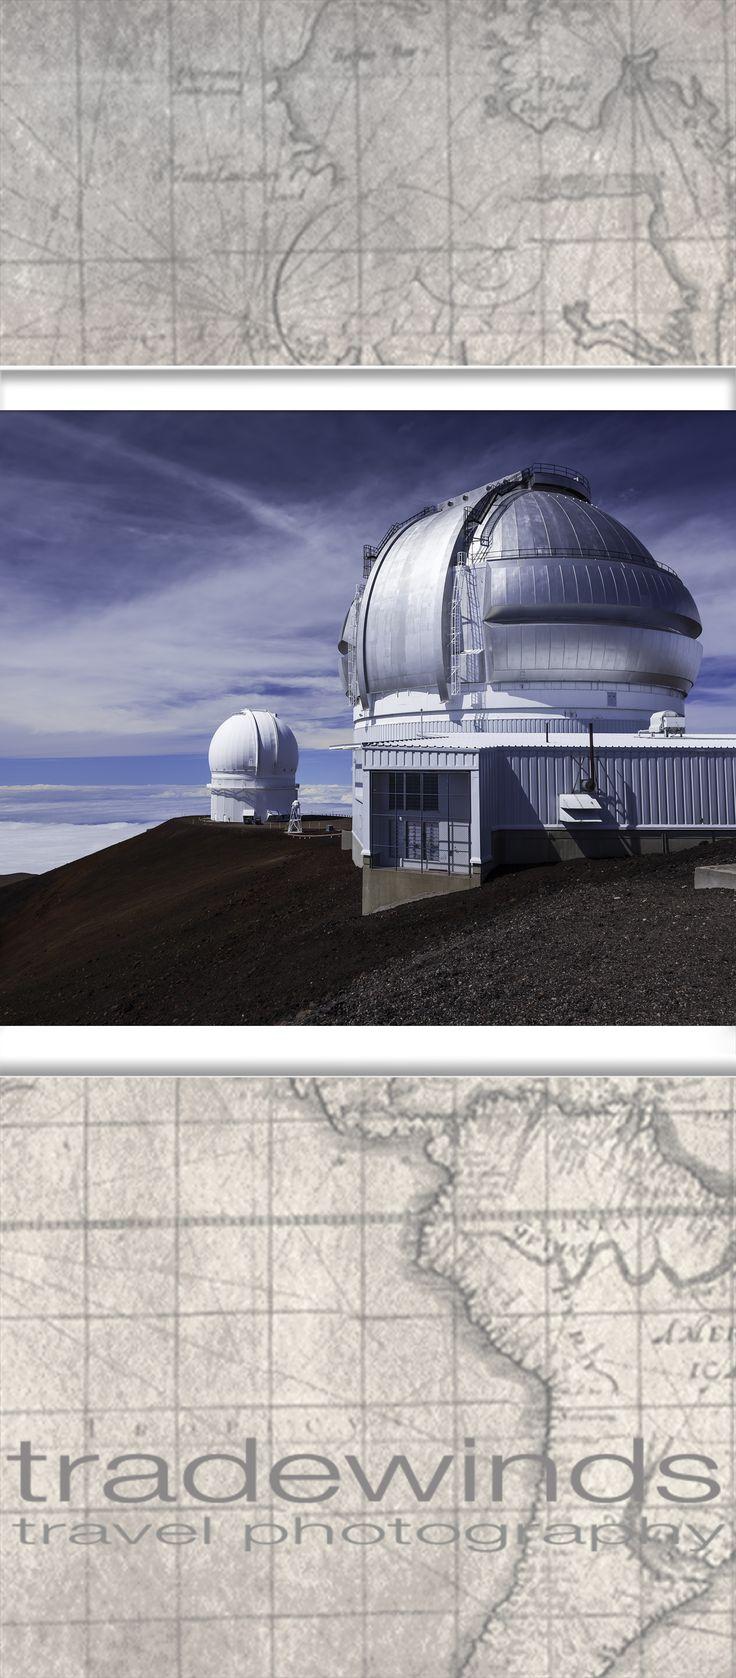 Gemini and Canada-France-Hawaii Telescope